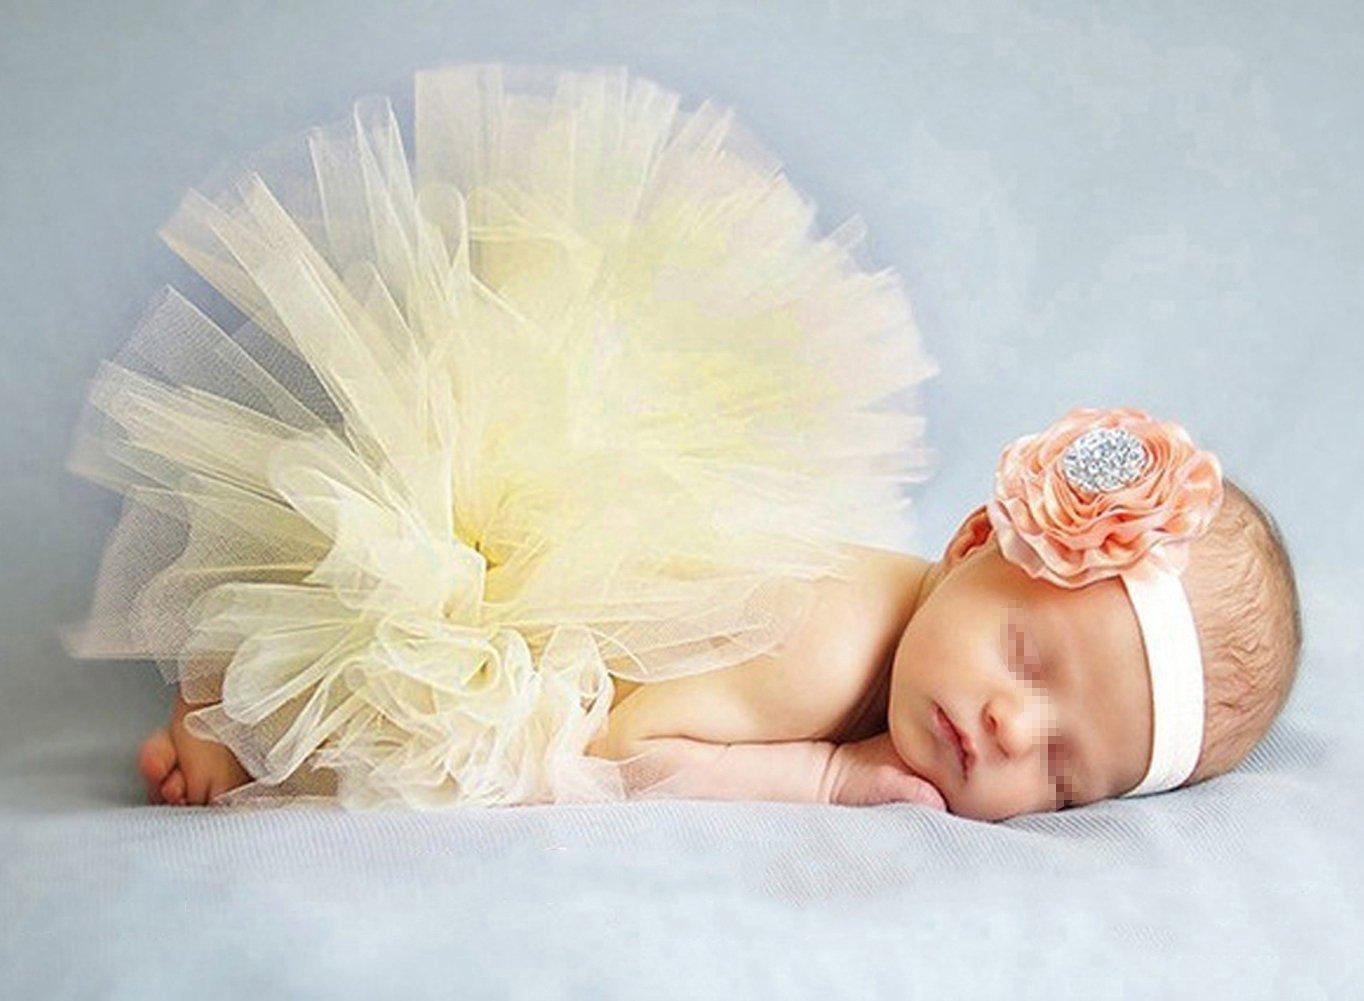 Butterem Neugeborene Baby Sä ugling Fotografie Stü tze Kostü m Outfits Tutu Rock Outfits Blume Stirnband Set, Dunkelblau ZUMUii ZUMU00005154